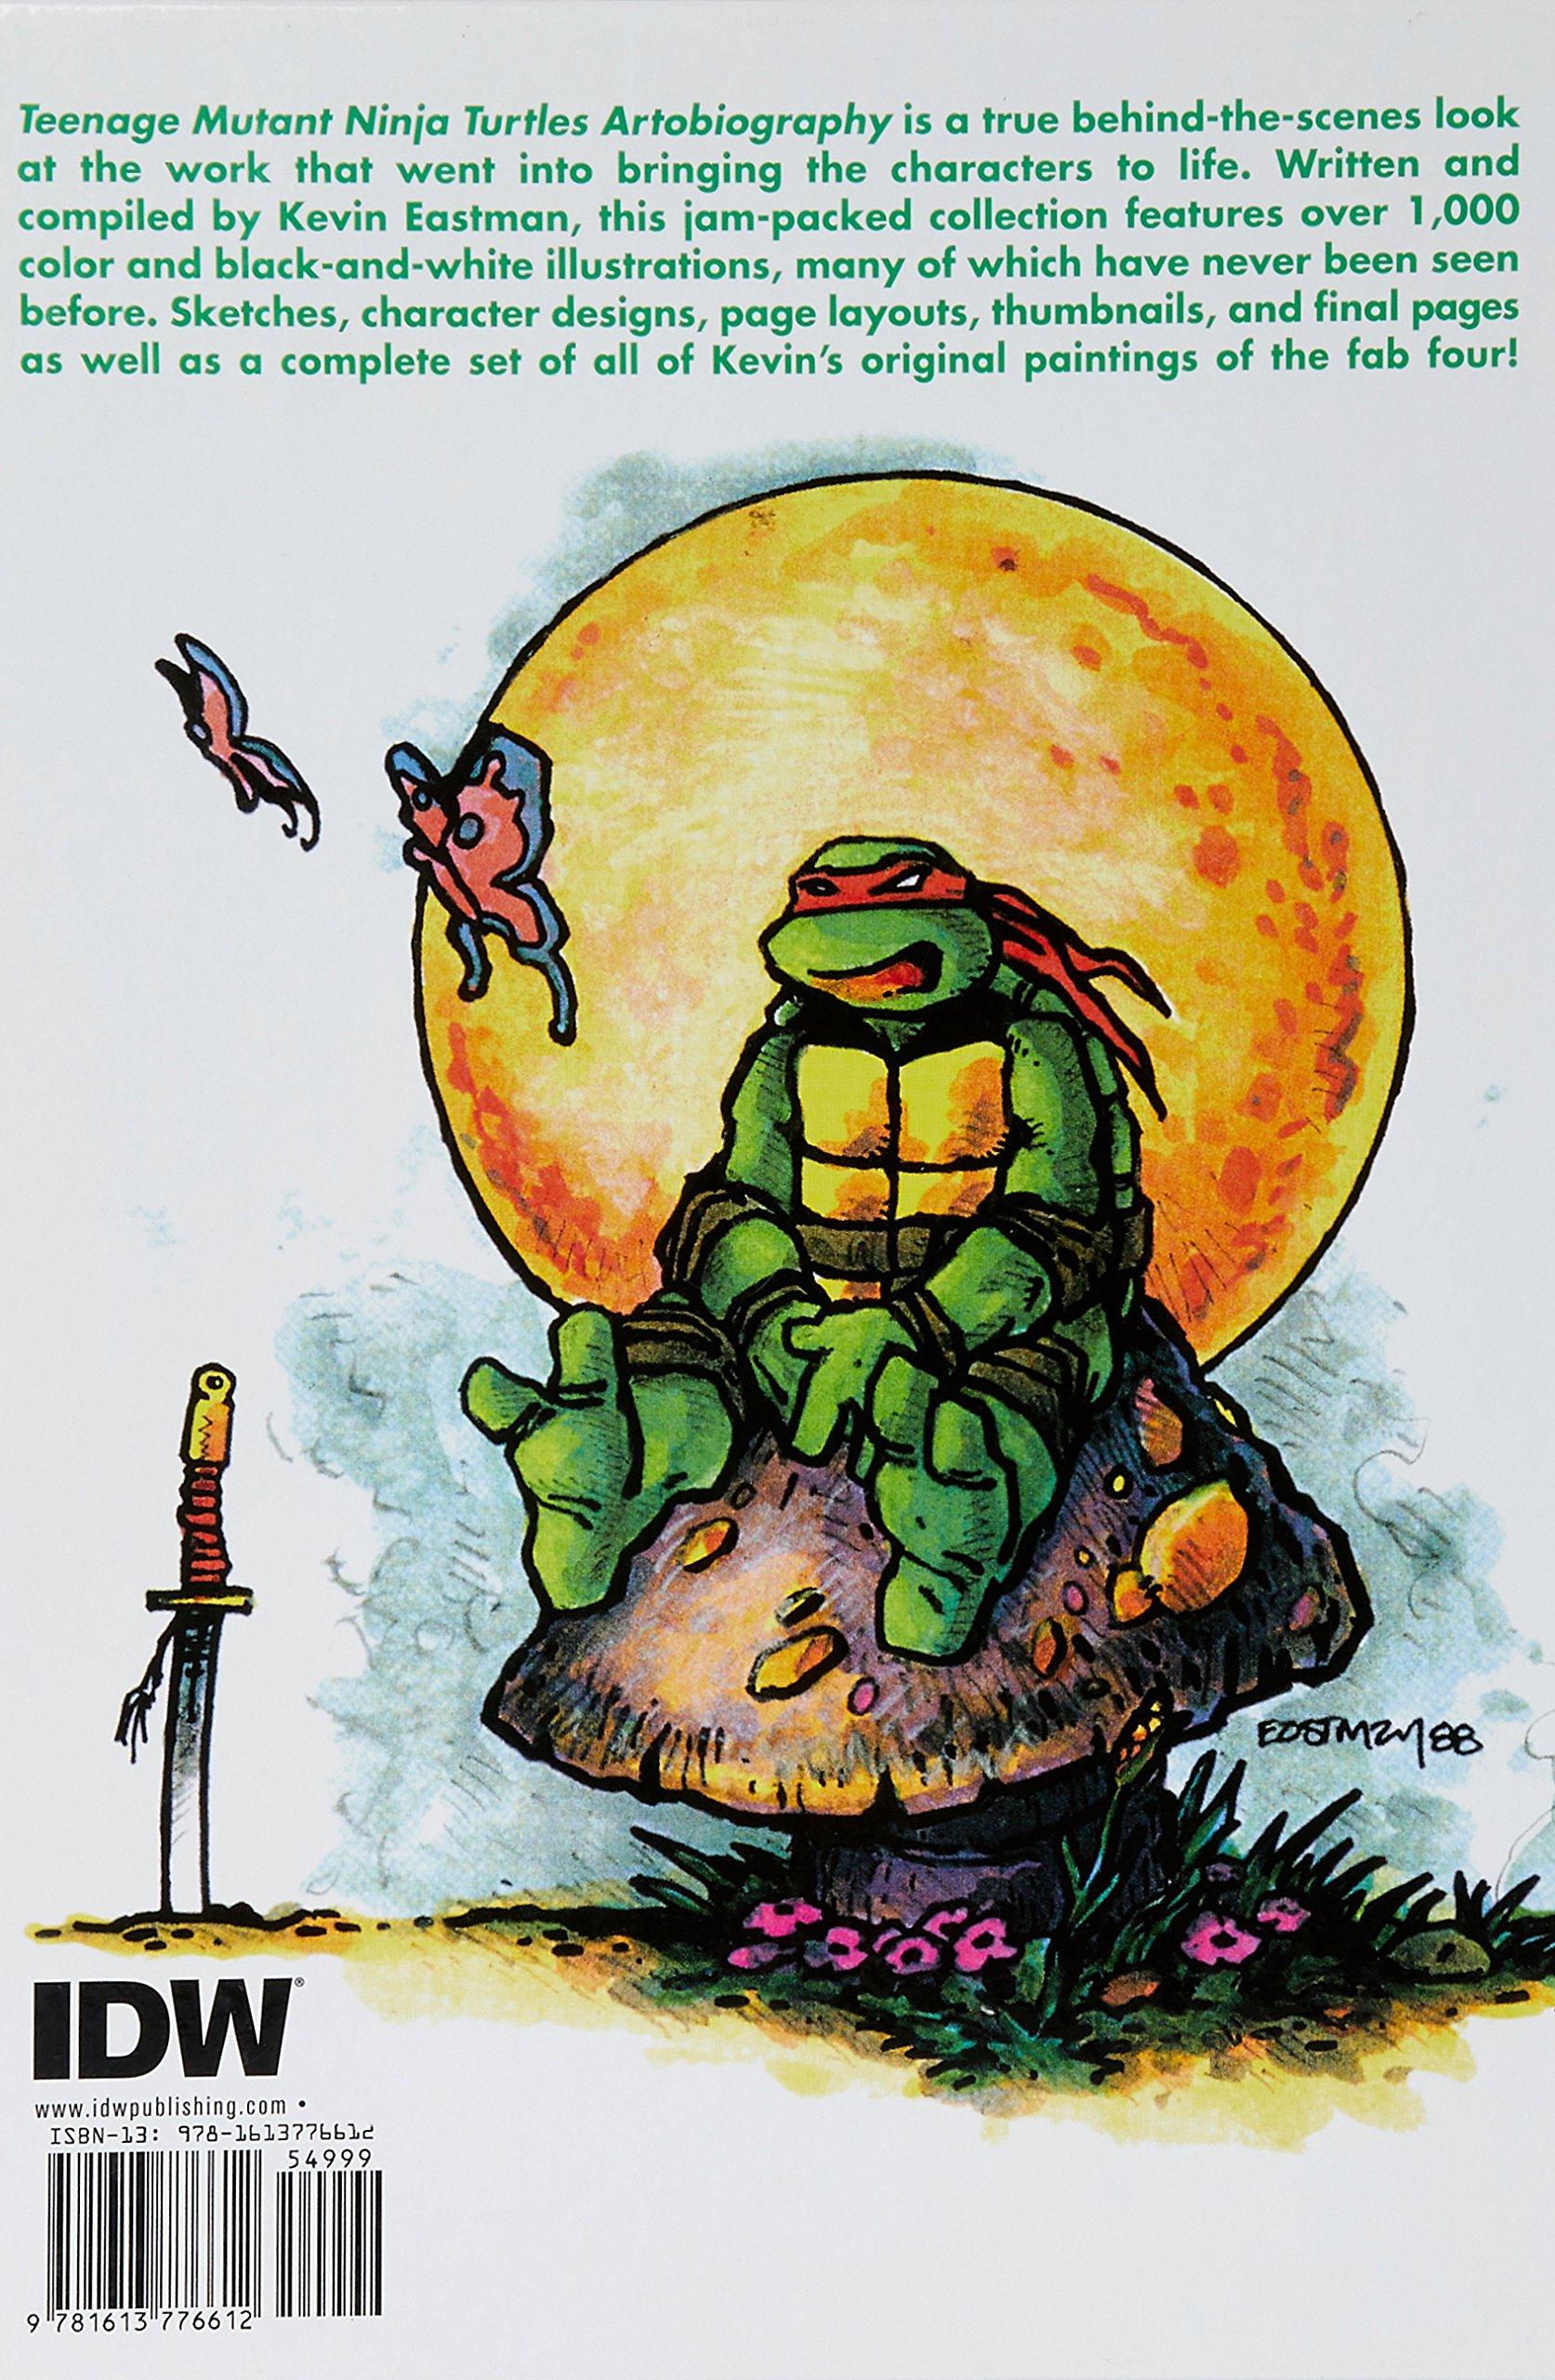 Teenage Mutant Ninja Turtles Artobiography: Amazon.es: Kevin ...